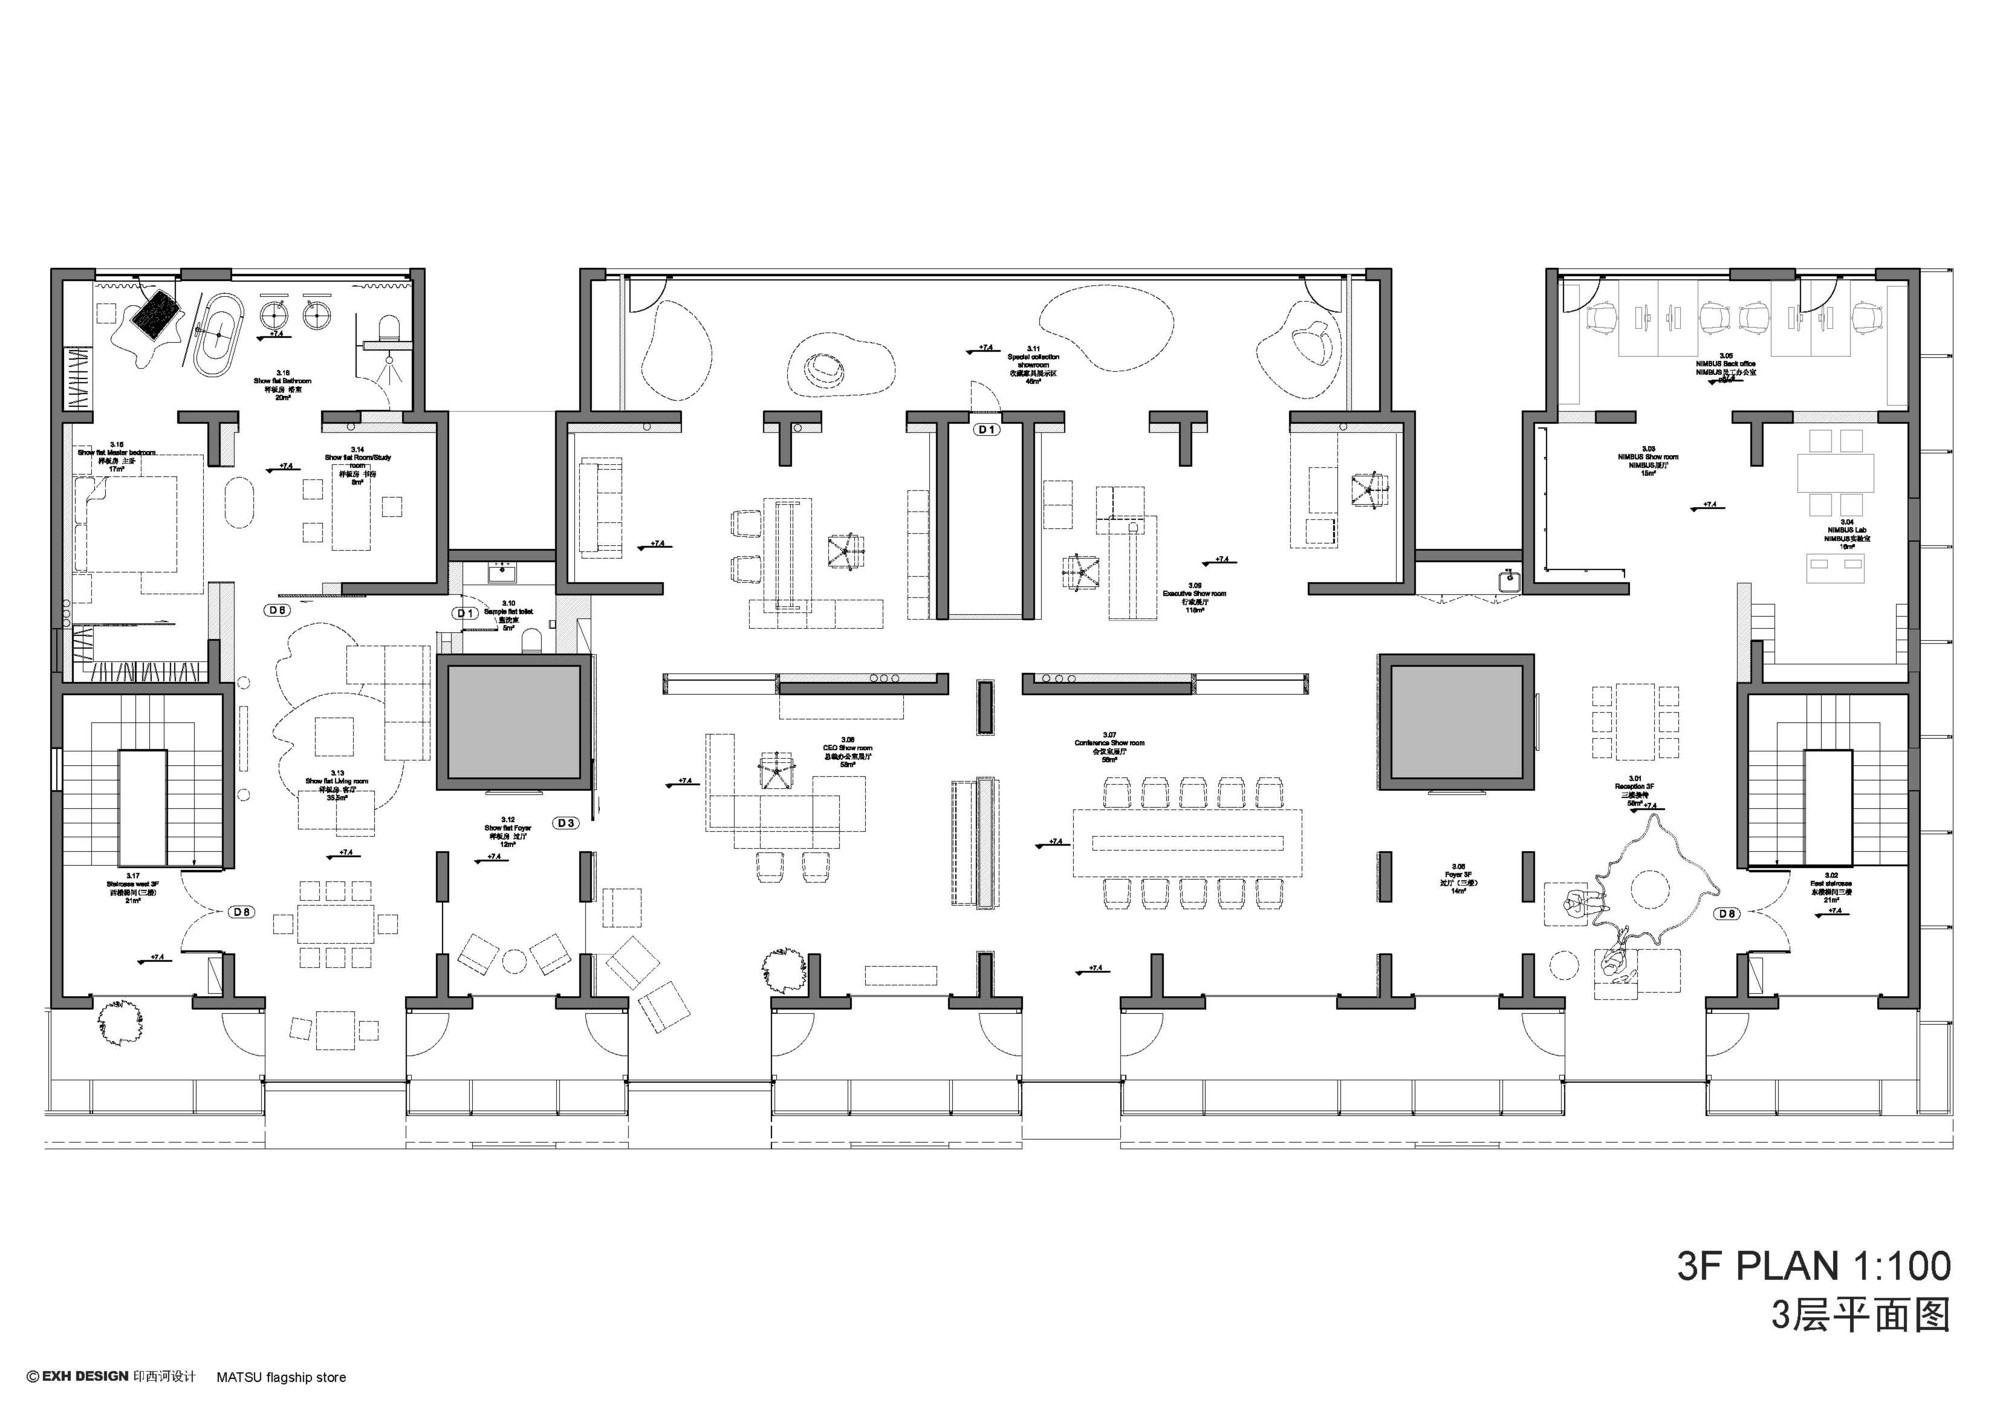 Matsu Flagship Store / EXH Design. 17 / 17. 3rd Floor Plan